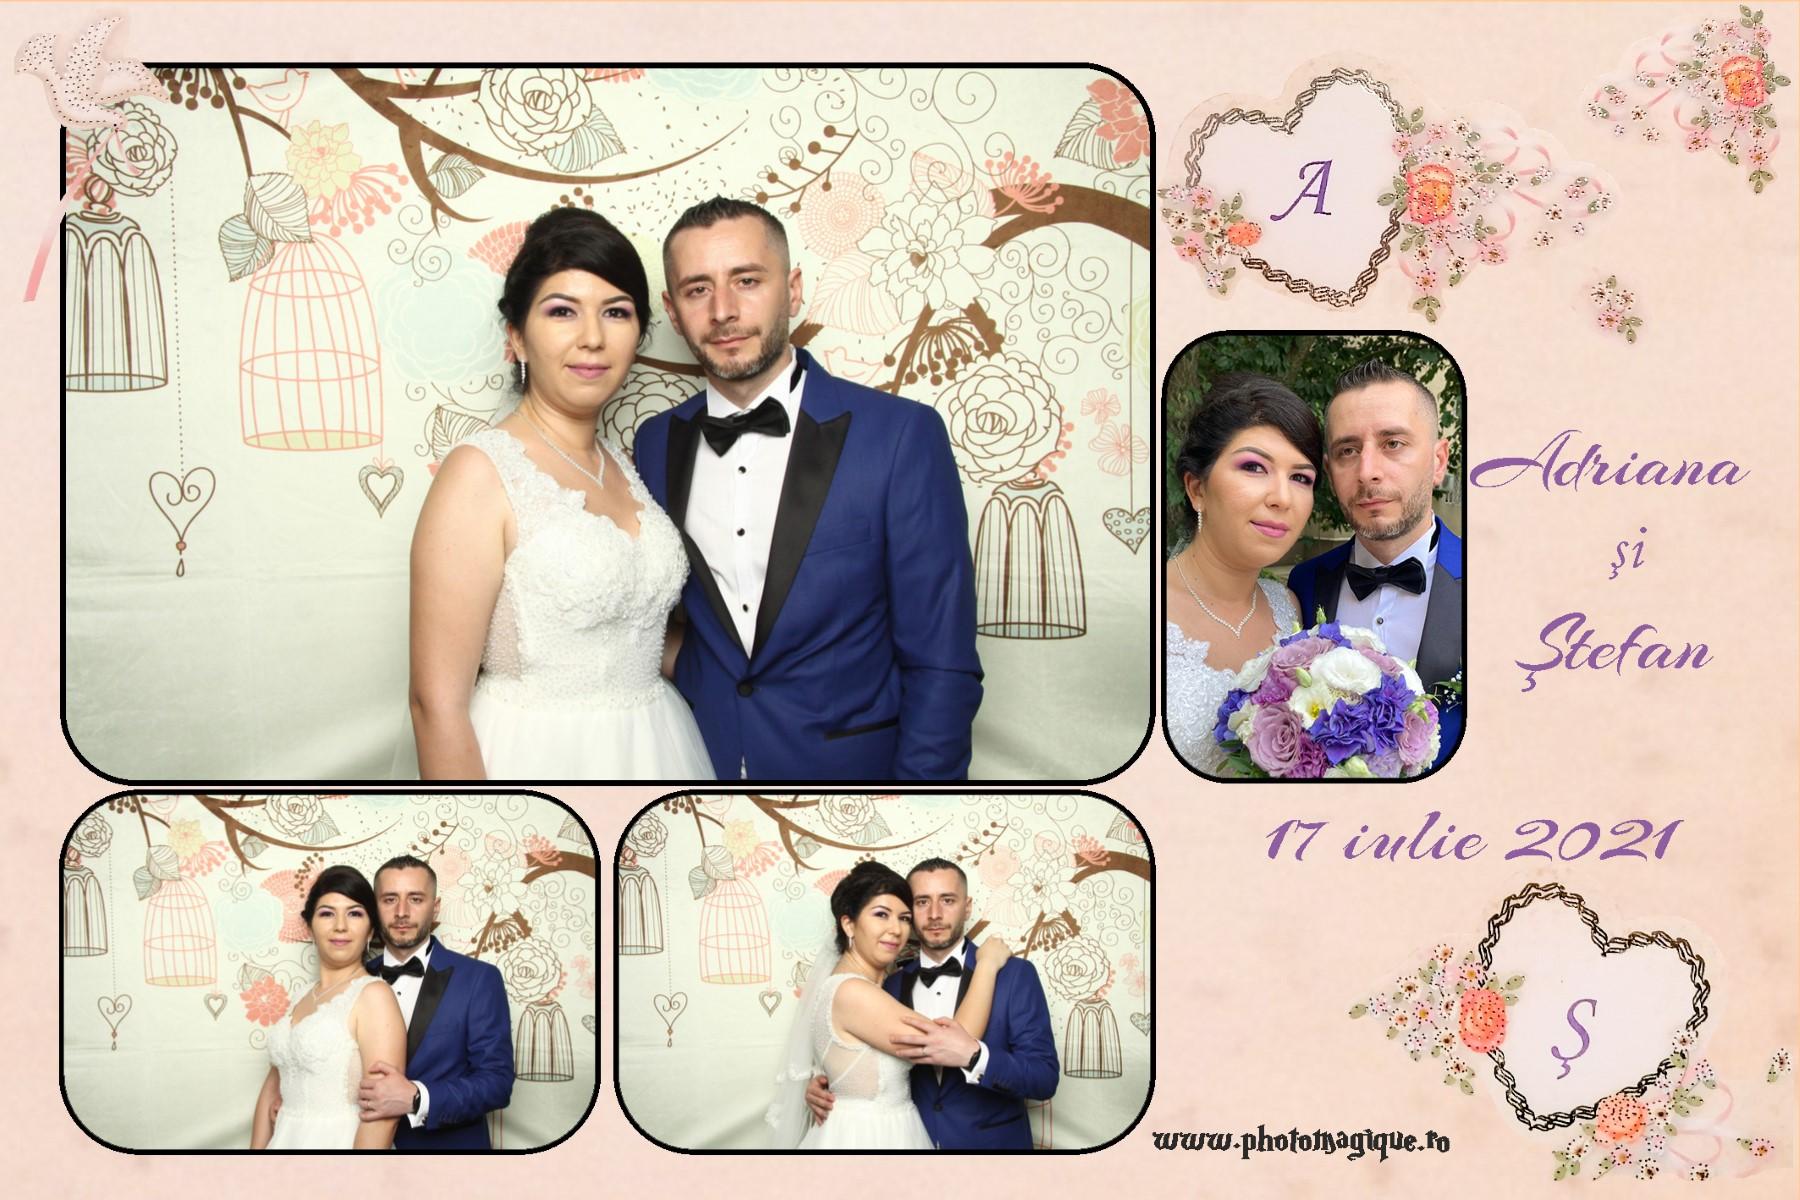 https://www.photomagique.ro/wp-content/uploads/2021/09/Adriana-si-Stefan-01.jpg